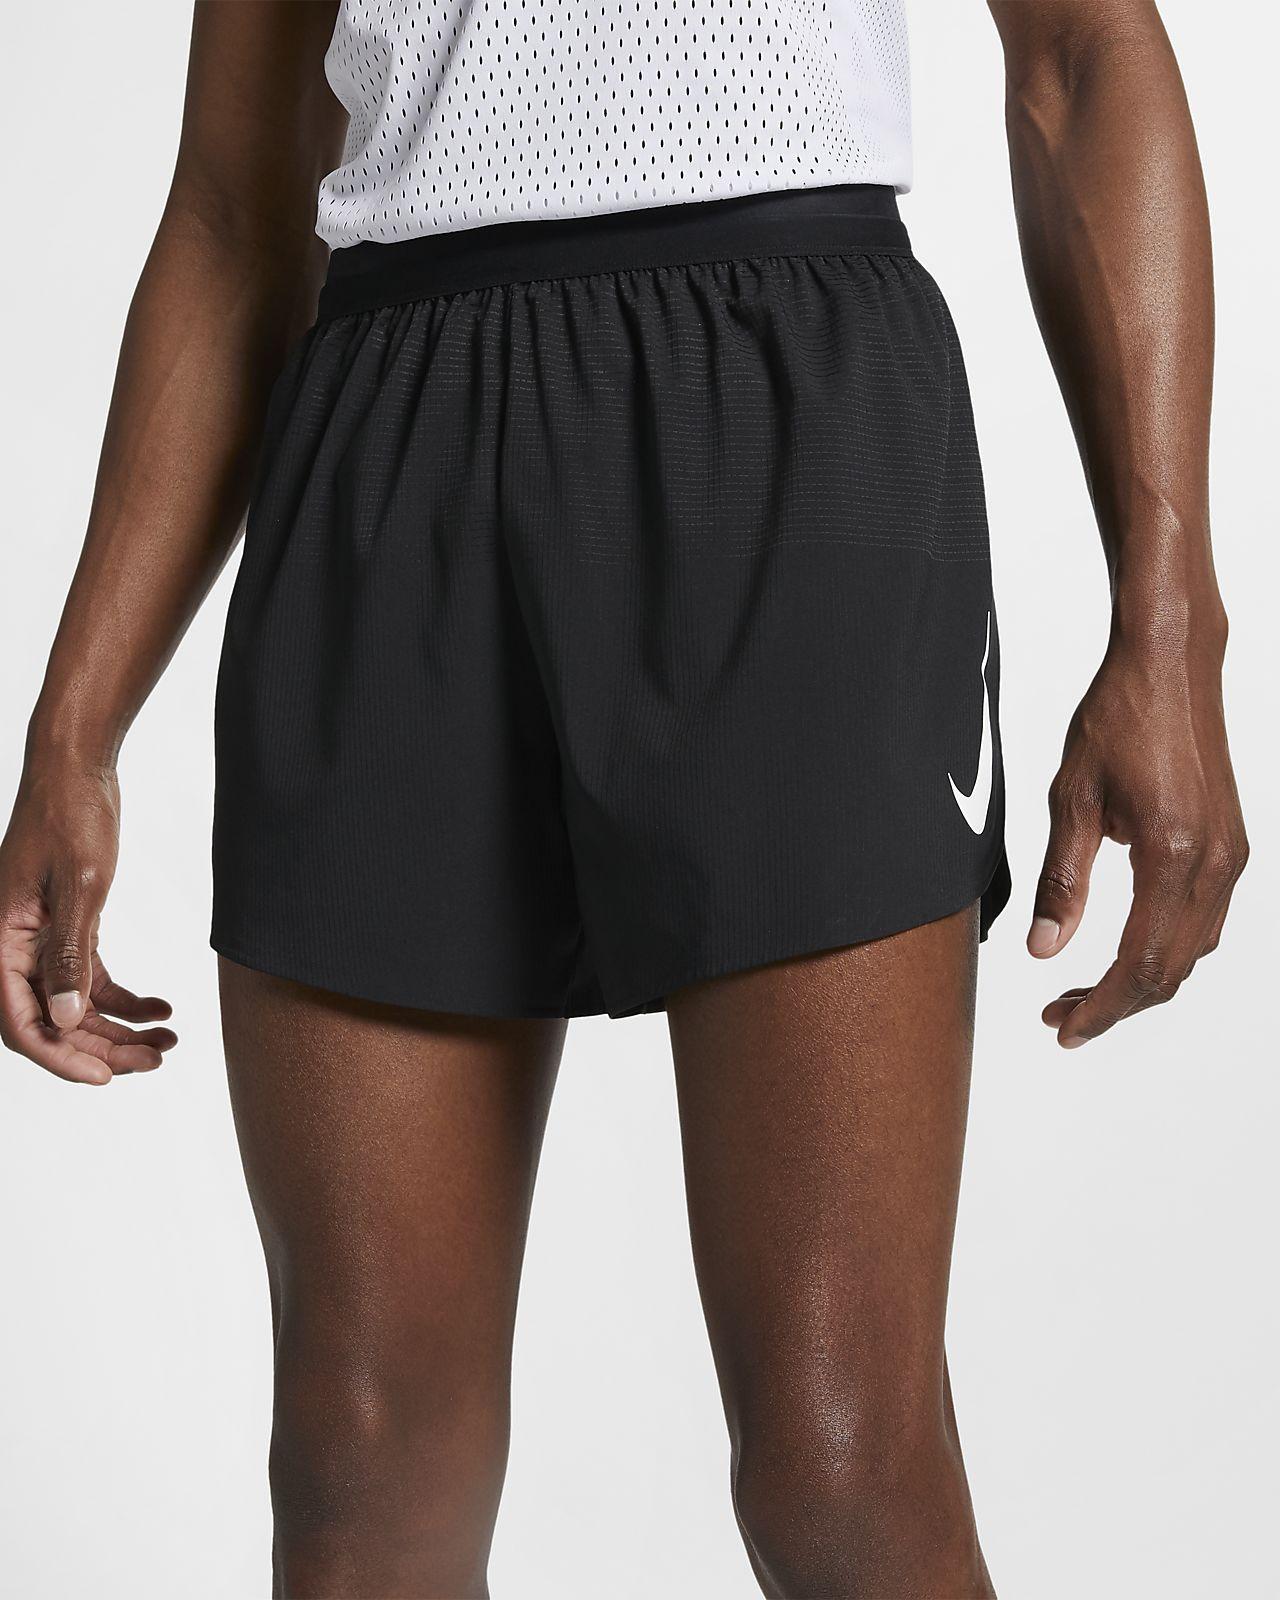 Short de running Nike AeroSwift (London) 10 cm